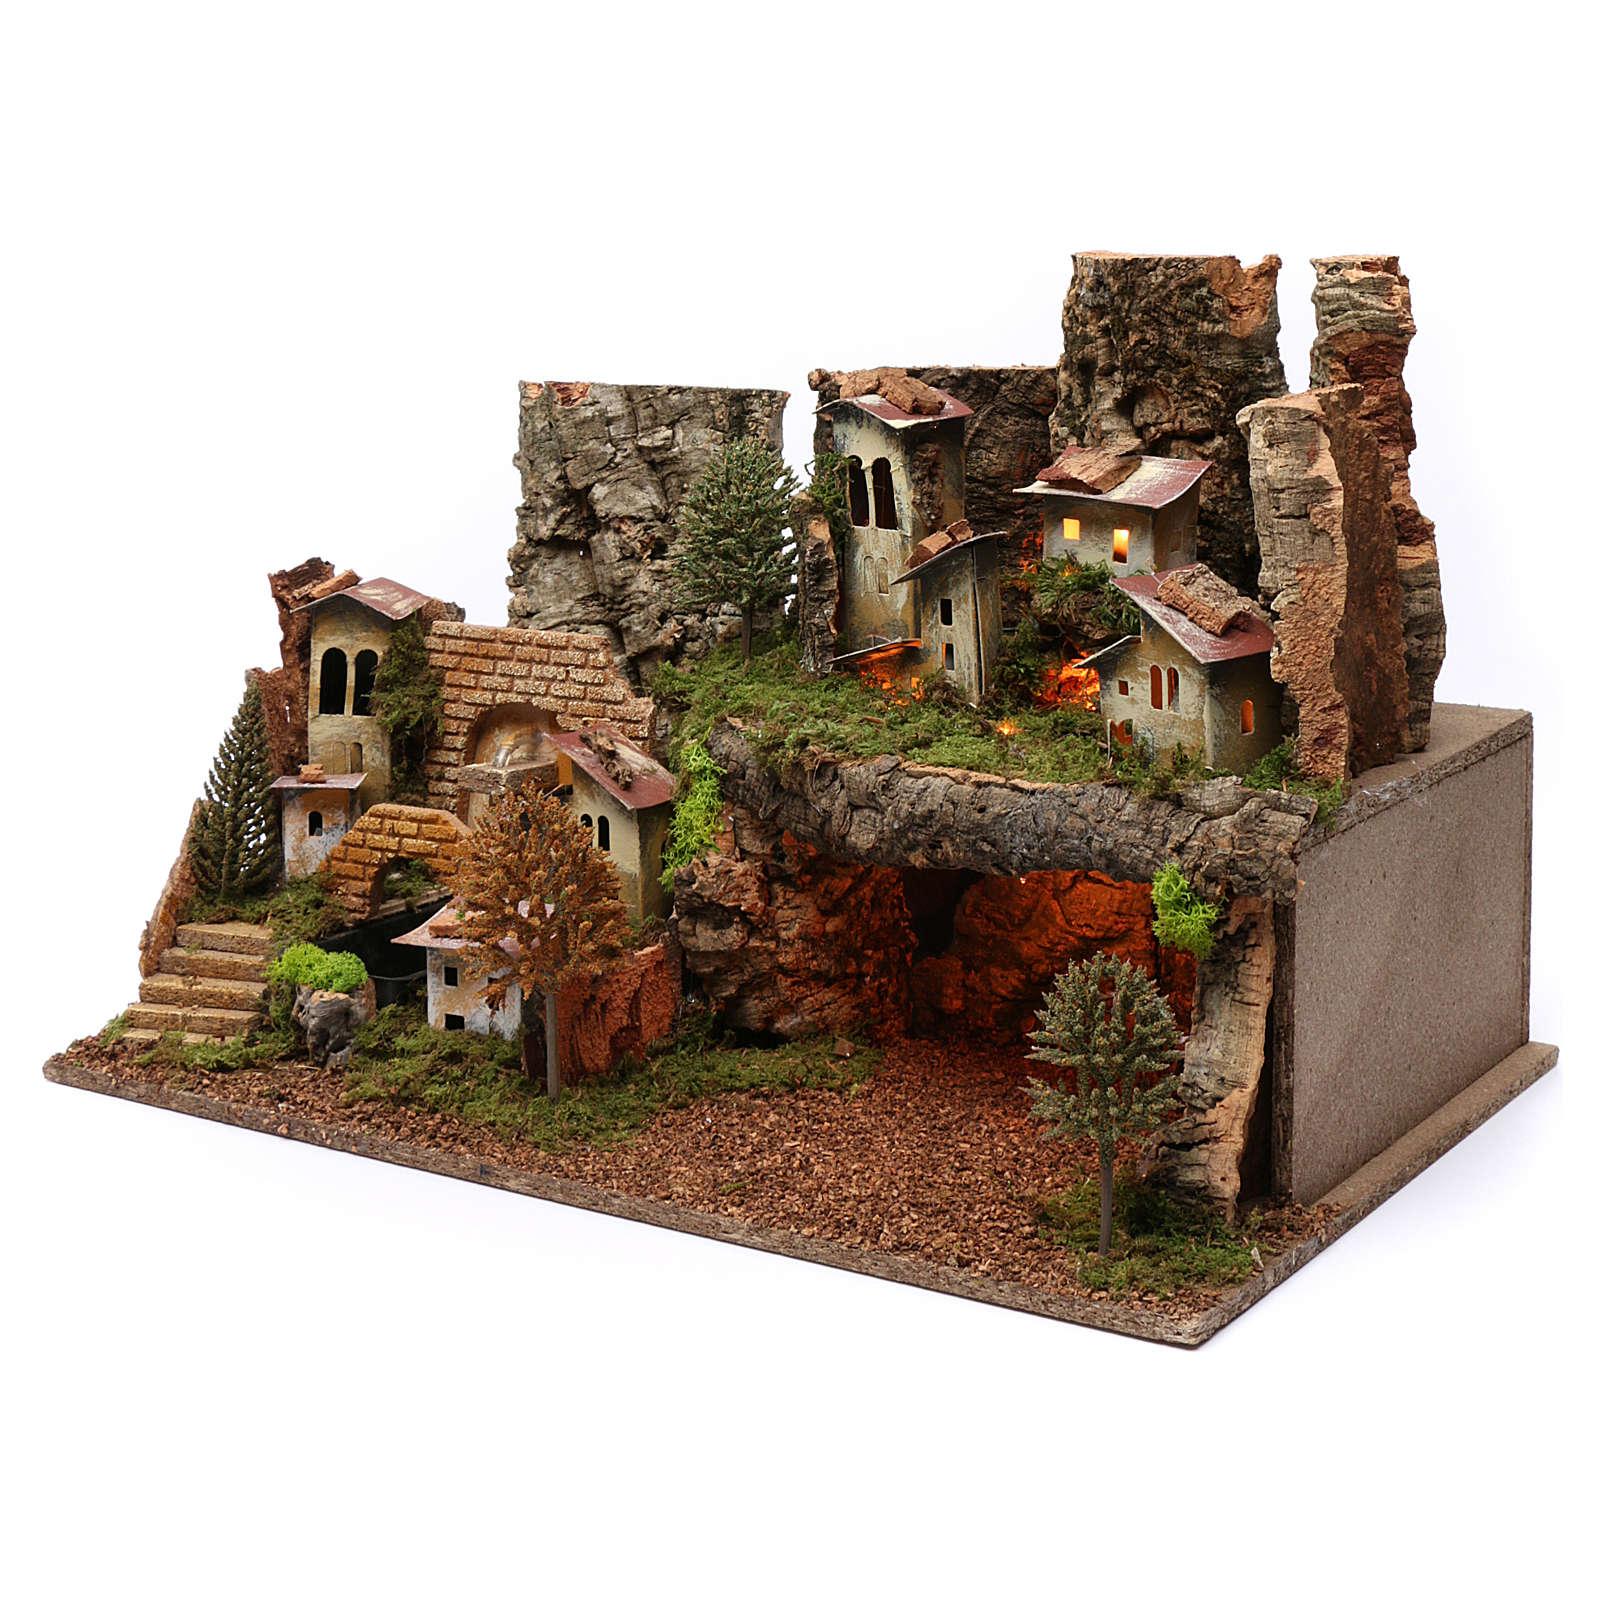 Paesaggio grotta fontana luci 40X60X40 cm per figure 7-8 cm 4